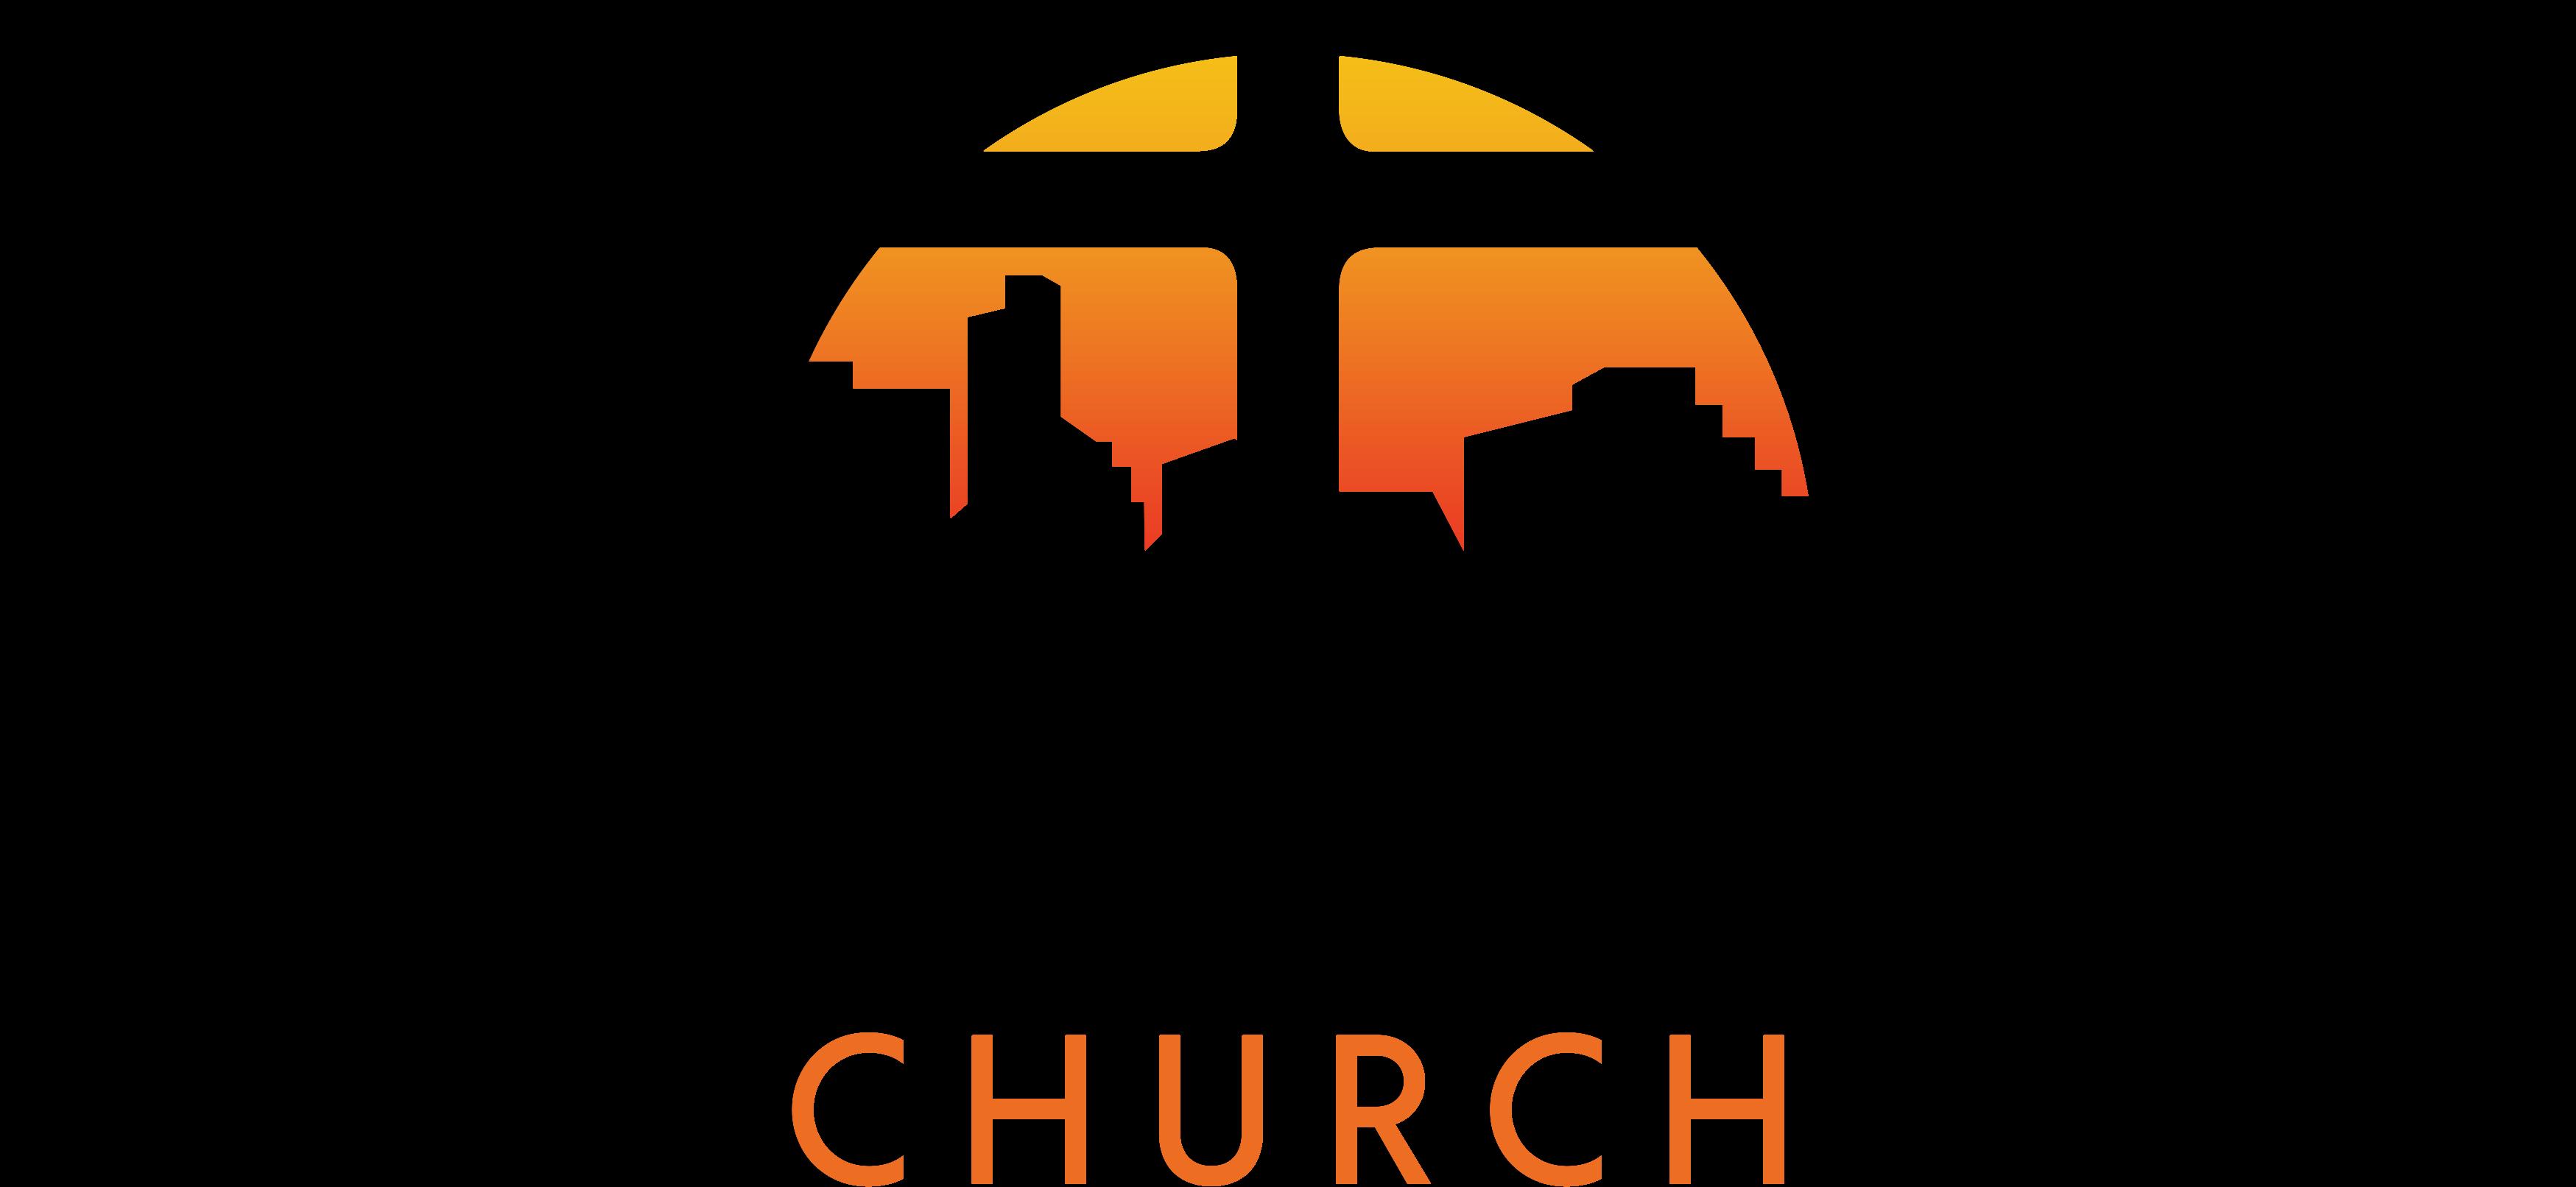 Faithful Baptist Church of Bryan/College Station logo